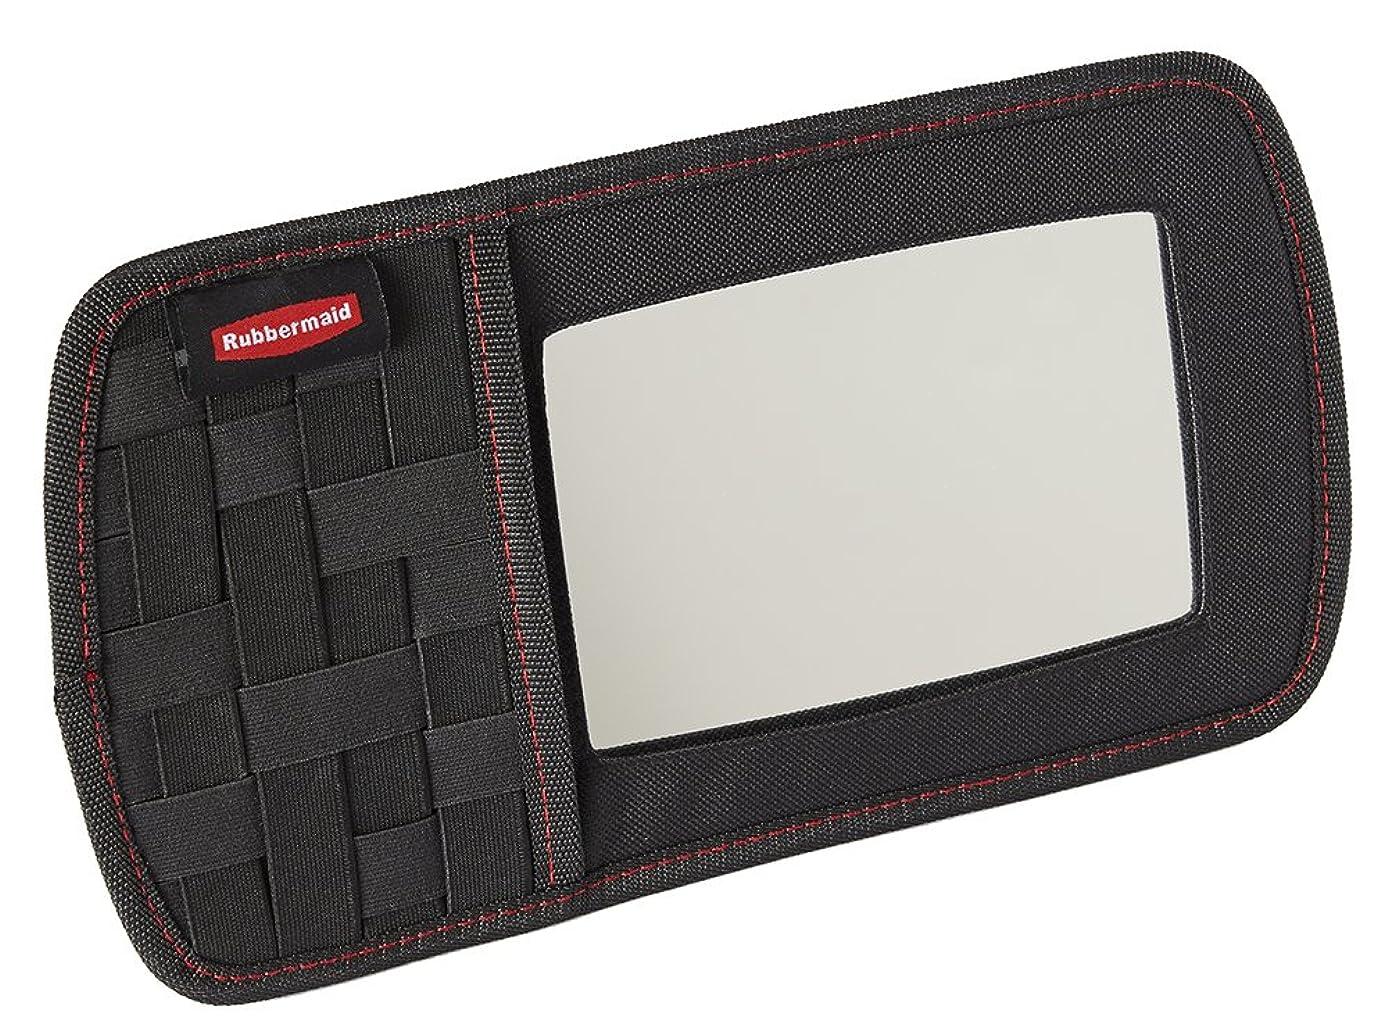 Rubbermaid Automotive Sun Visor Car Accessory: All Purpose Storage Organizer with Vanity Mirror and Elastic Grid